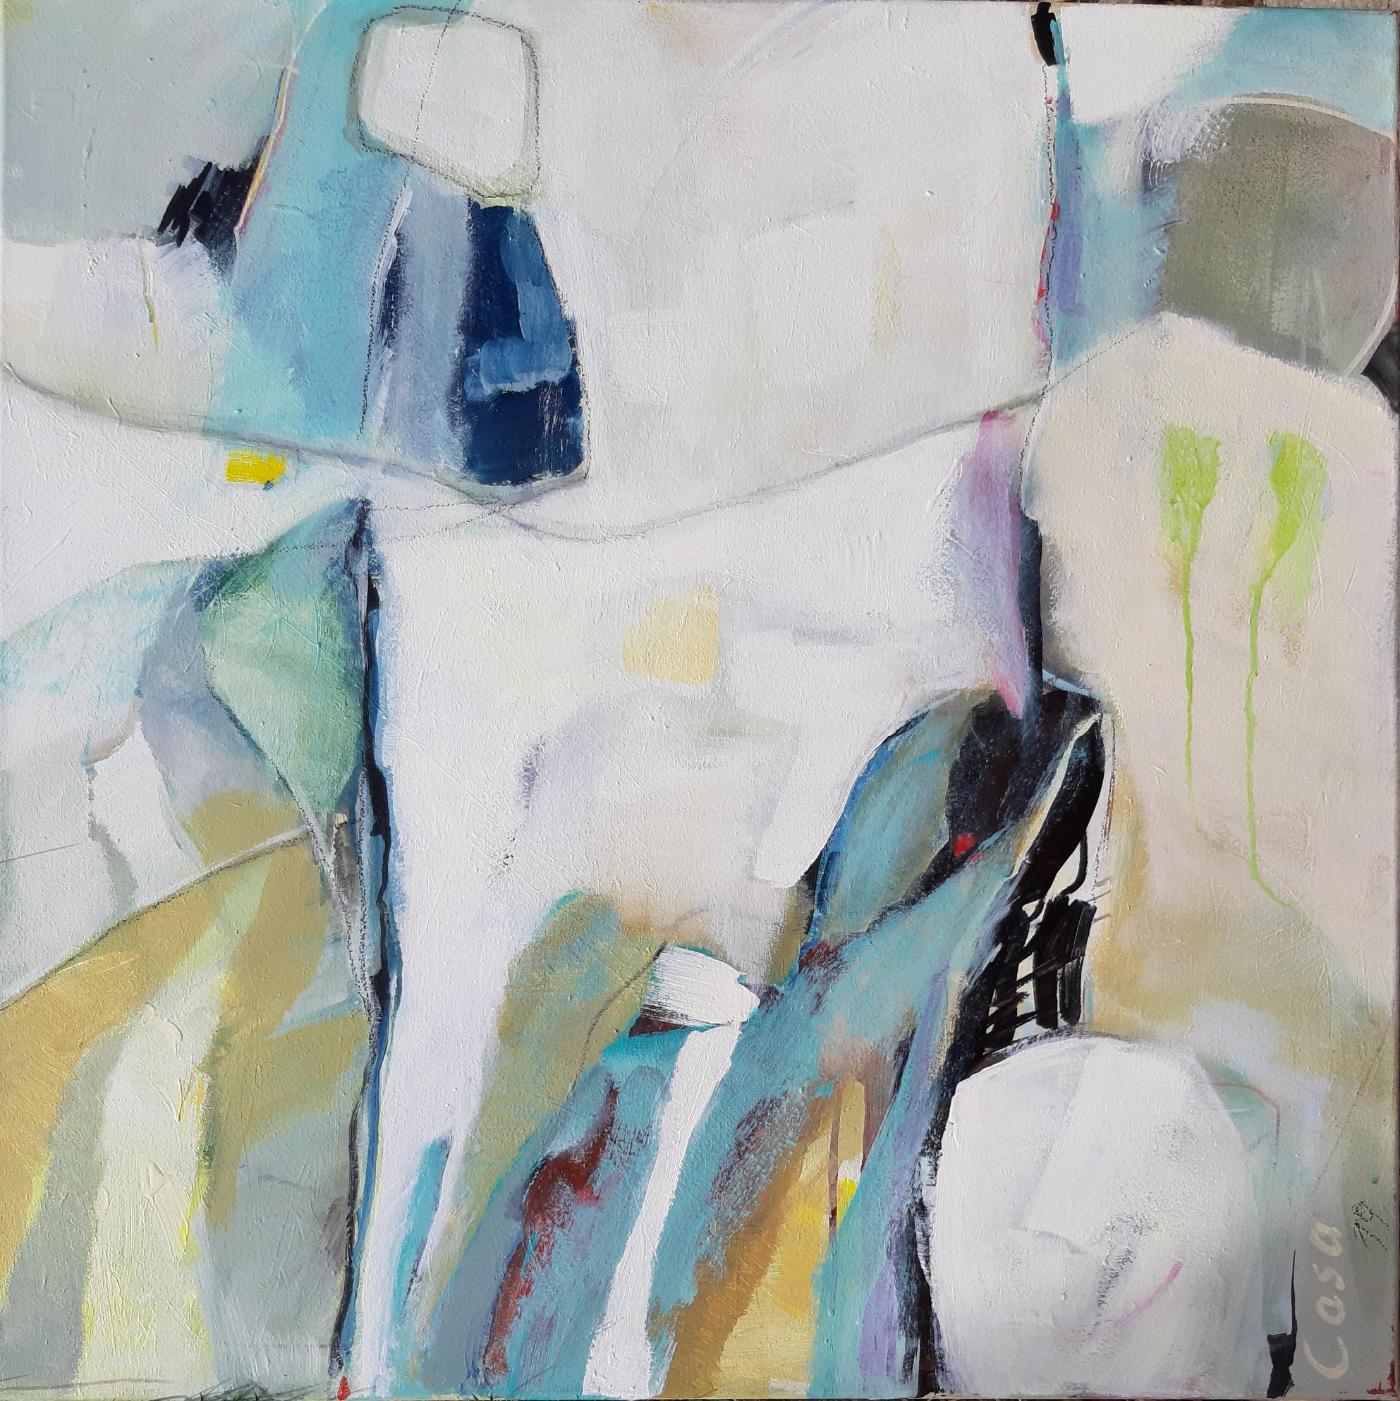 Winter - Acryl auf Leinwand, 80 x 80 cm